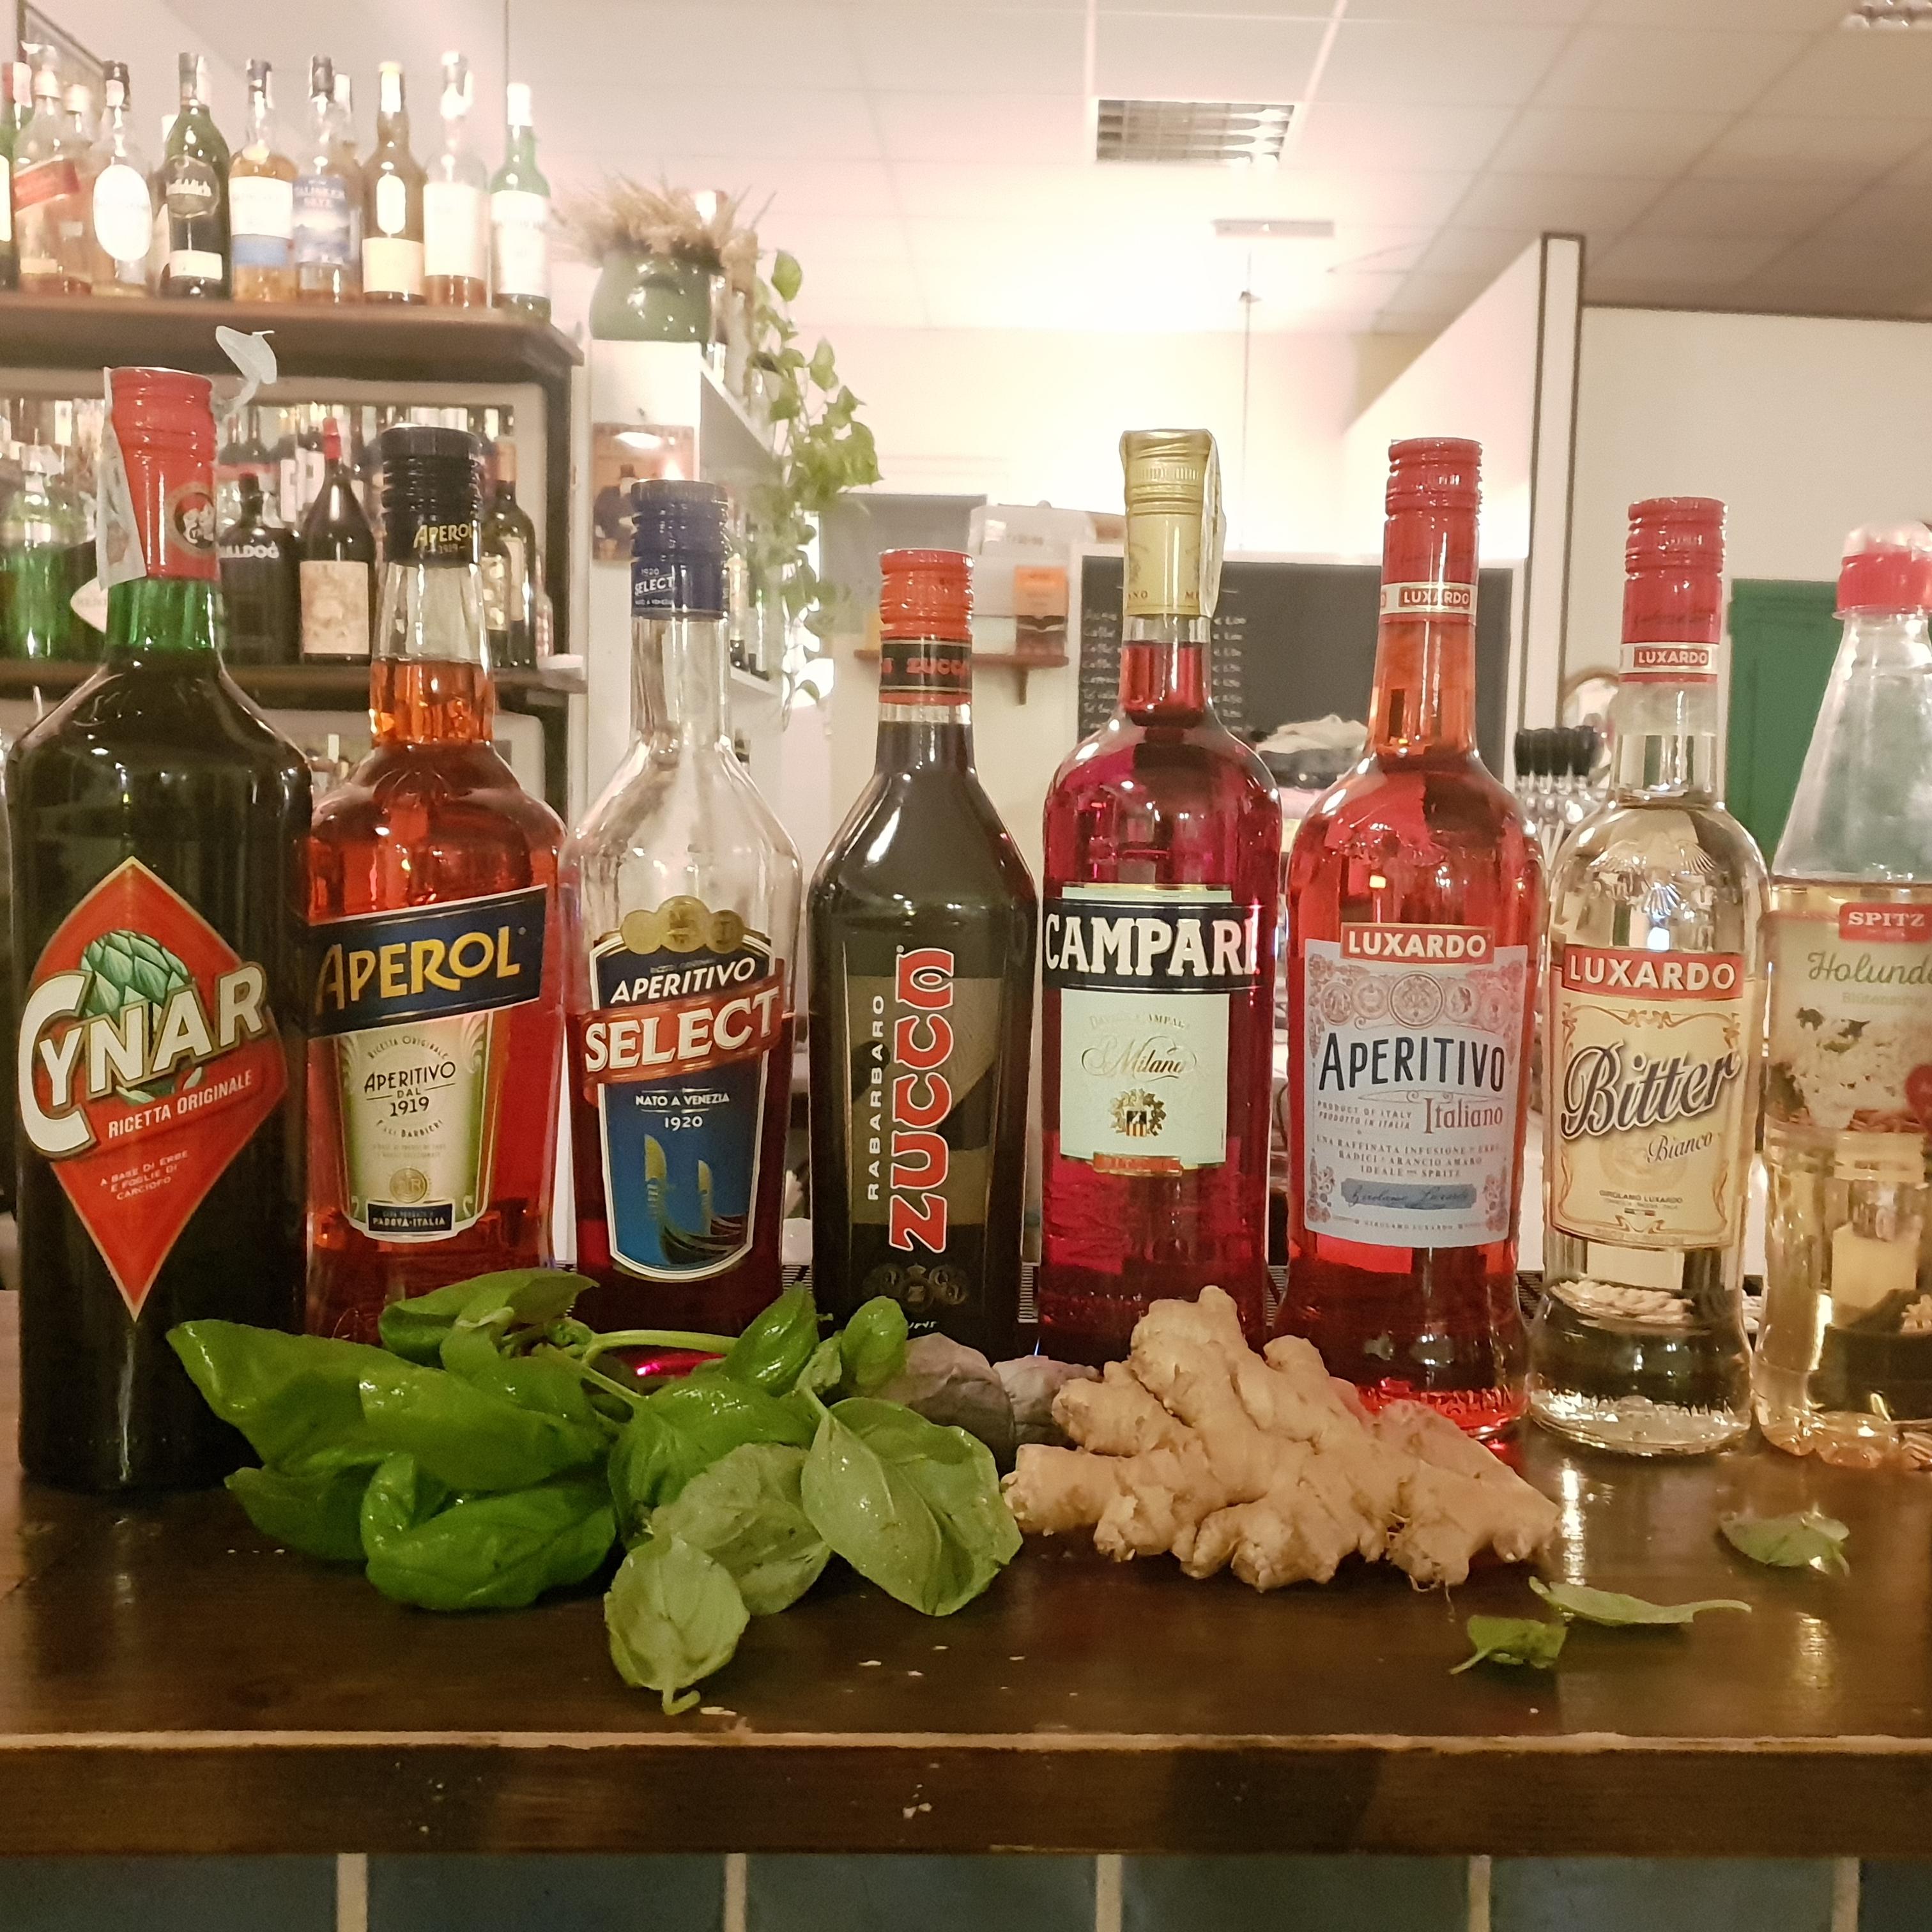 Spritz al Ripasso